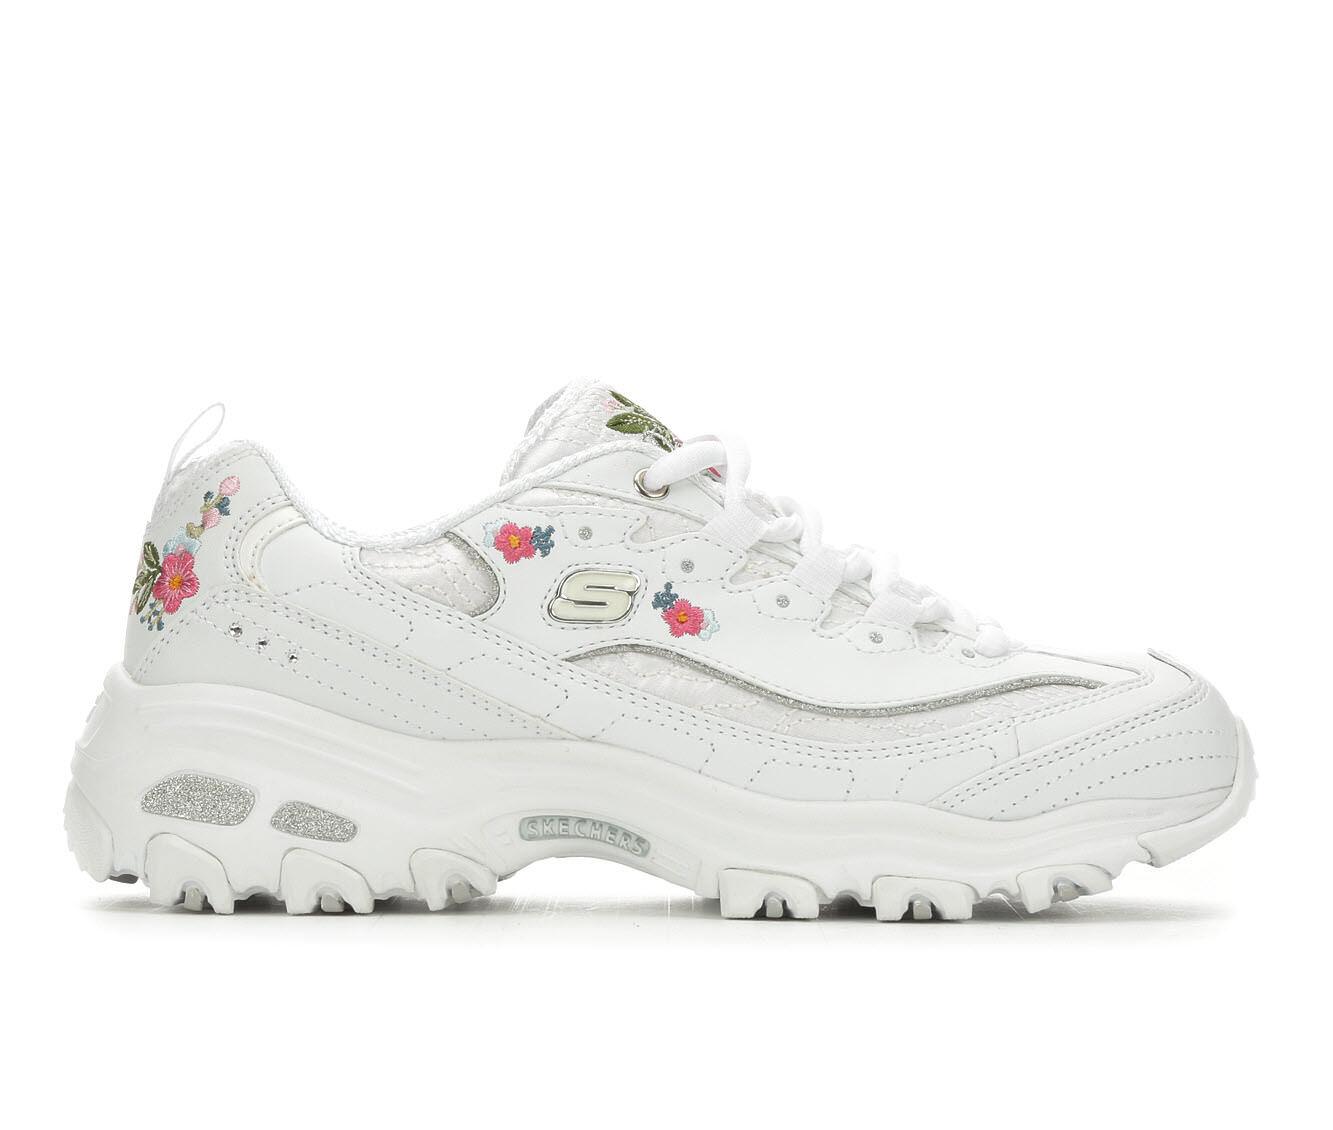 Women's Skechers D'Lites Bright Blossoms 11977 Sneakers